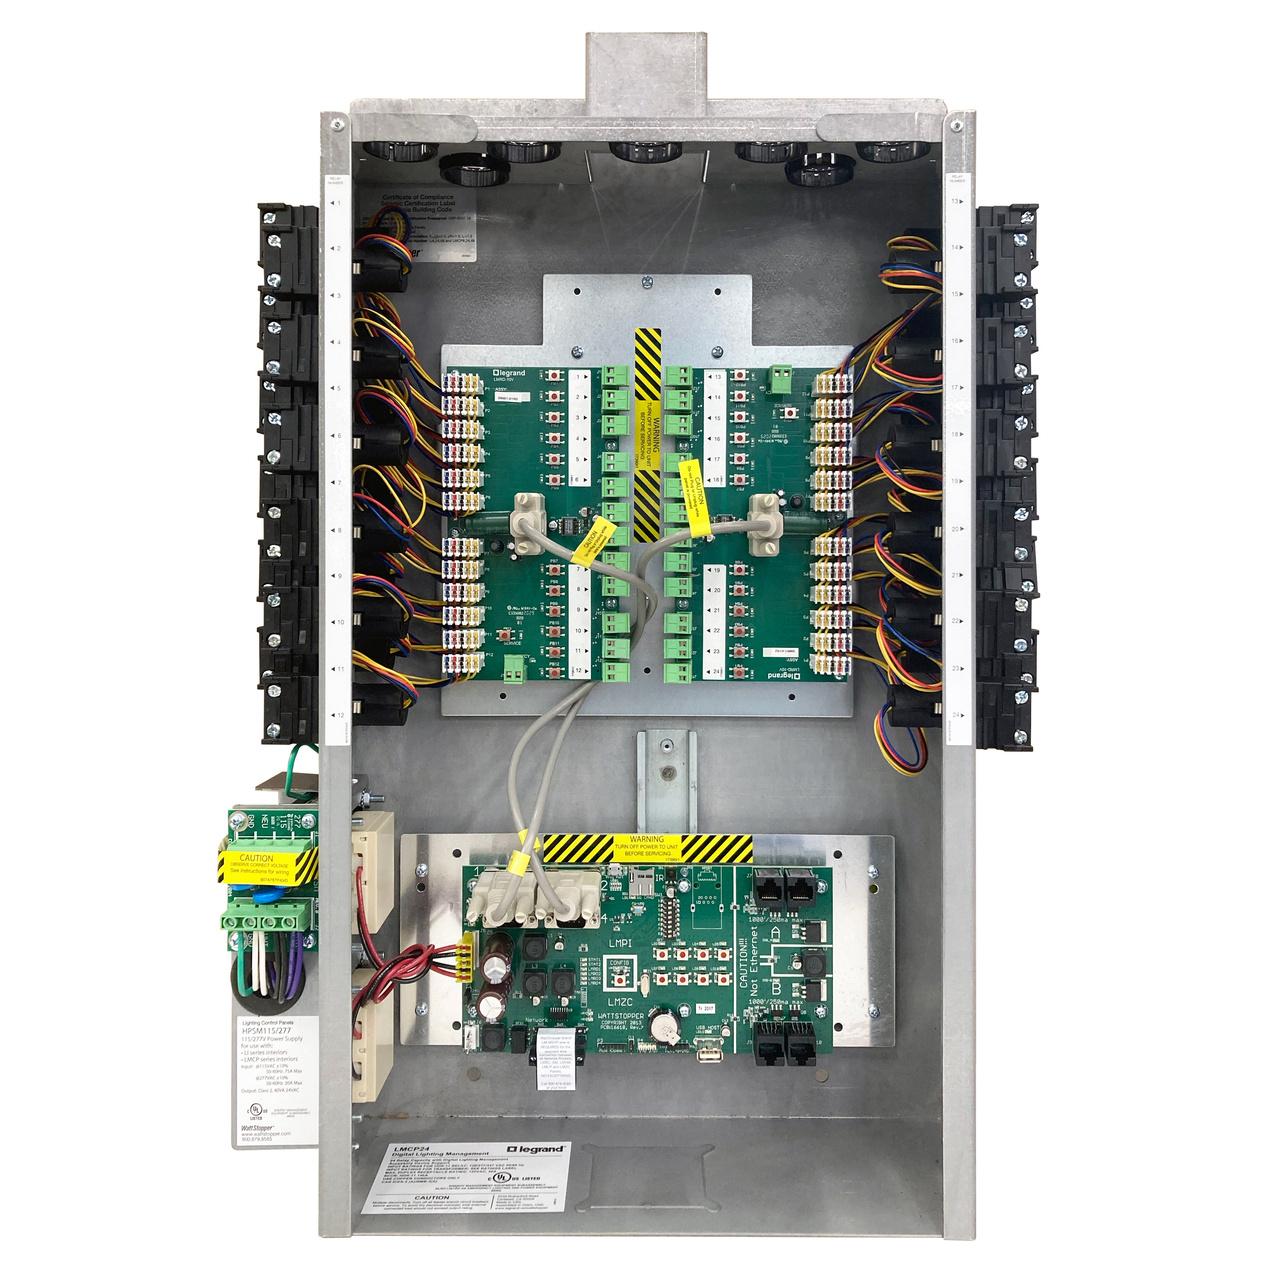 8 relay 0 10v dimming panel digital